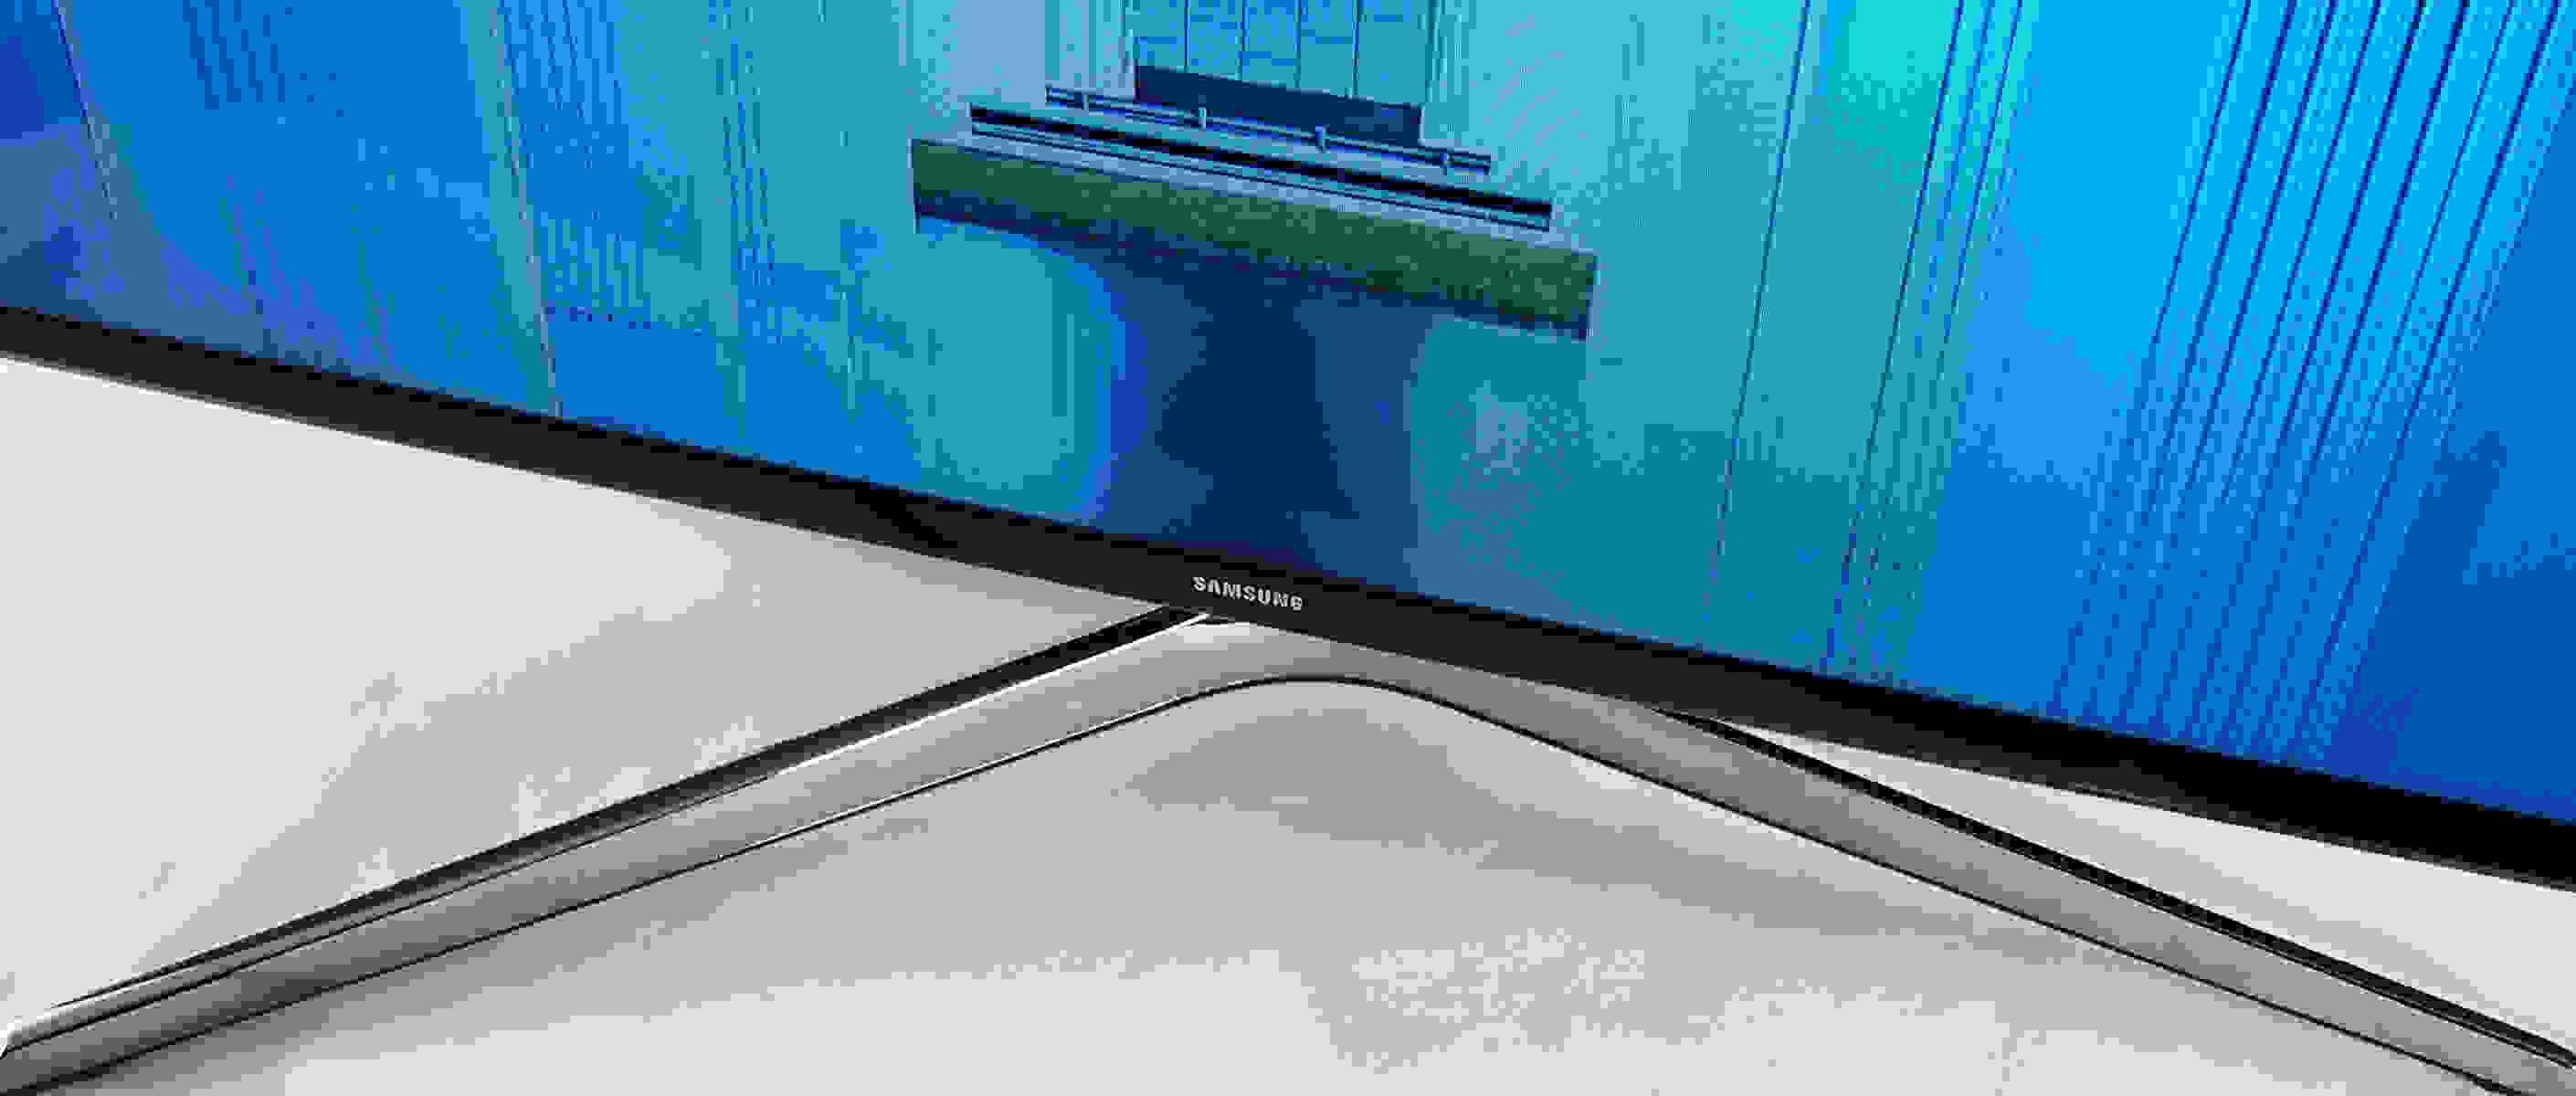 The Samsung UN48H6400 LED TV